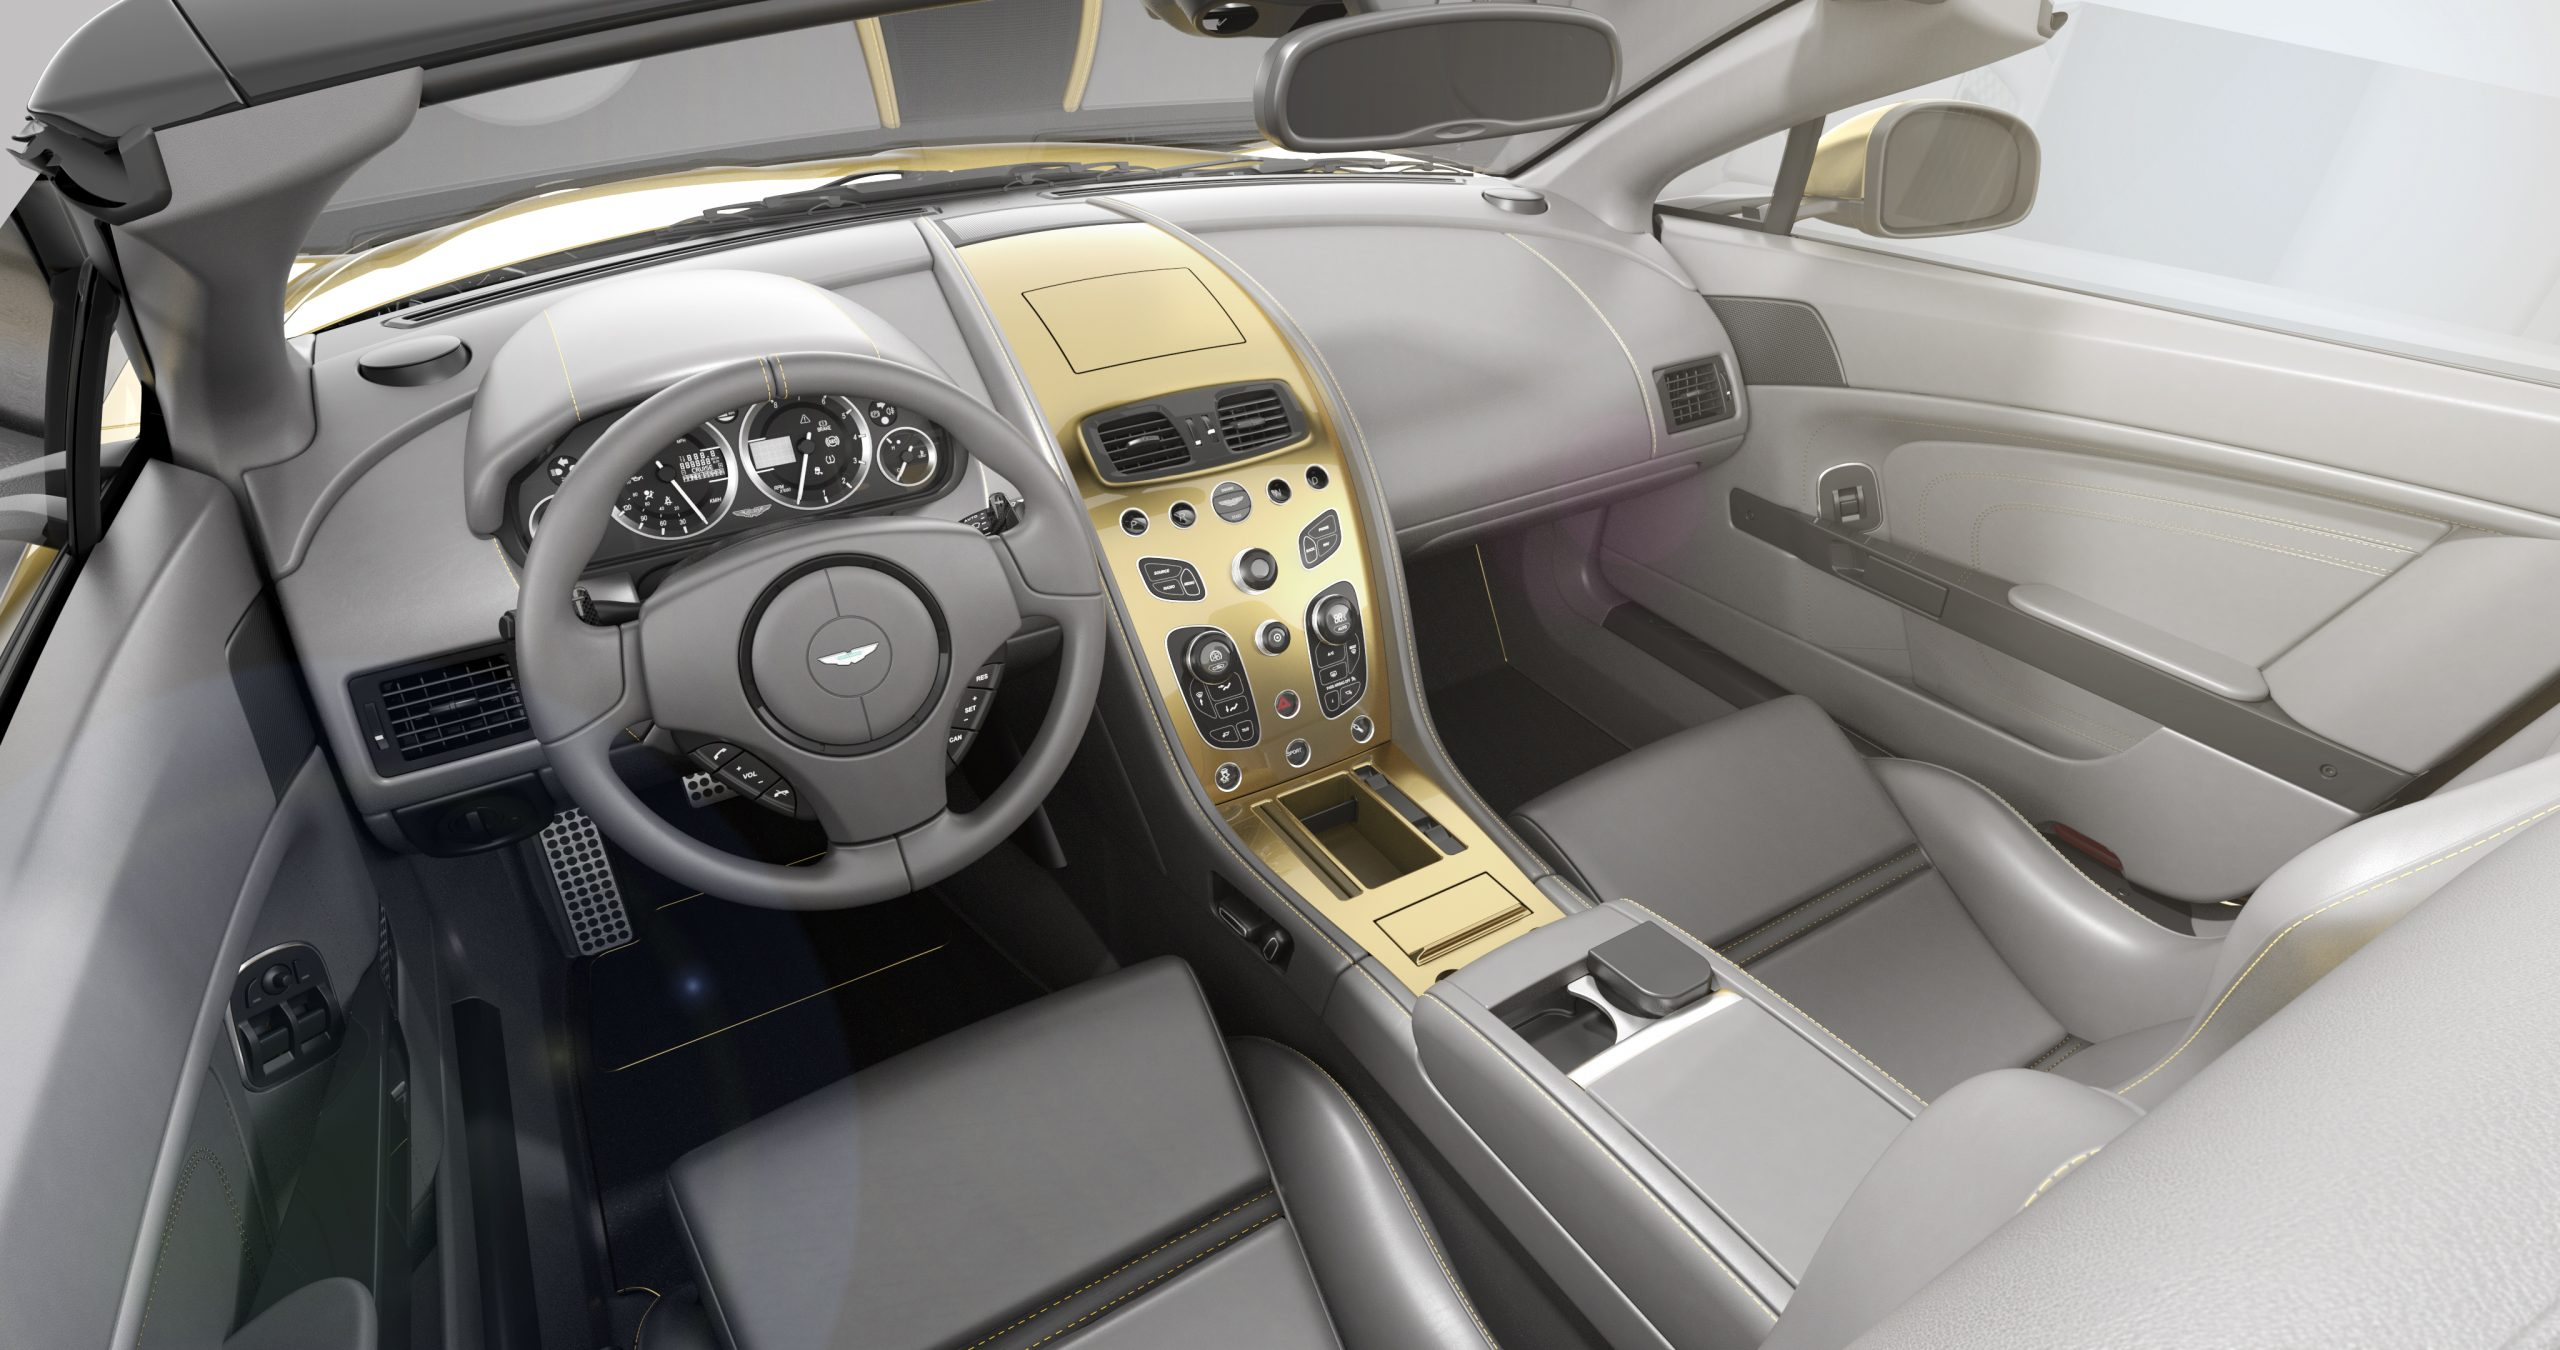 Aston Martin Vantage V12 Zagato Heritage TWINS by R-Reforged 5 Speedster interior